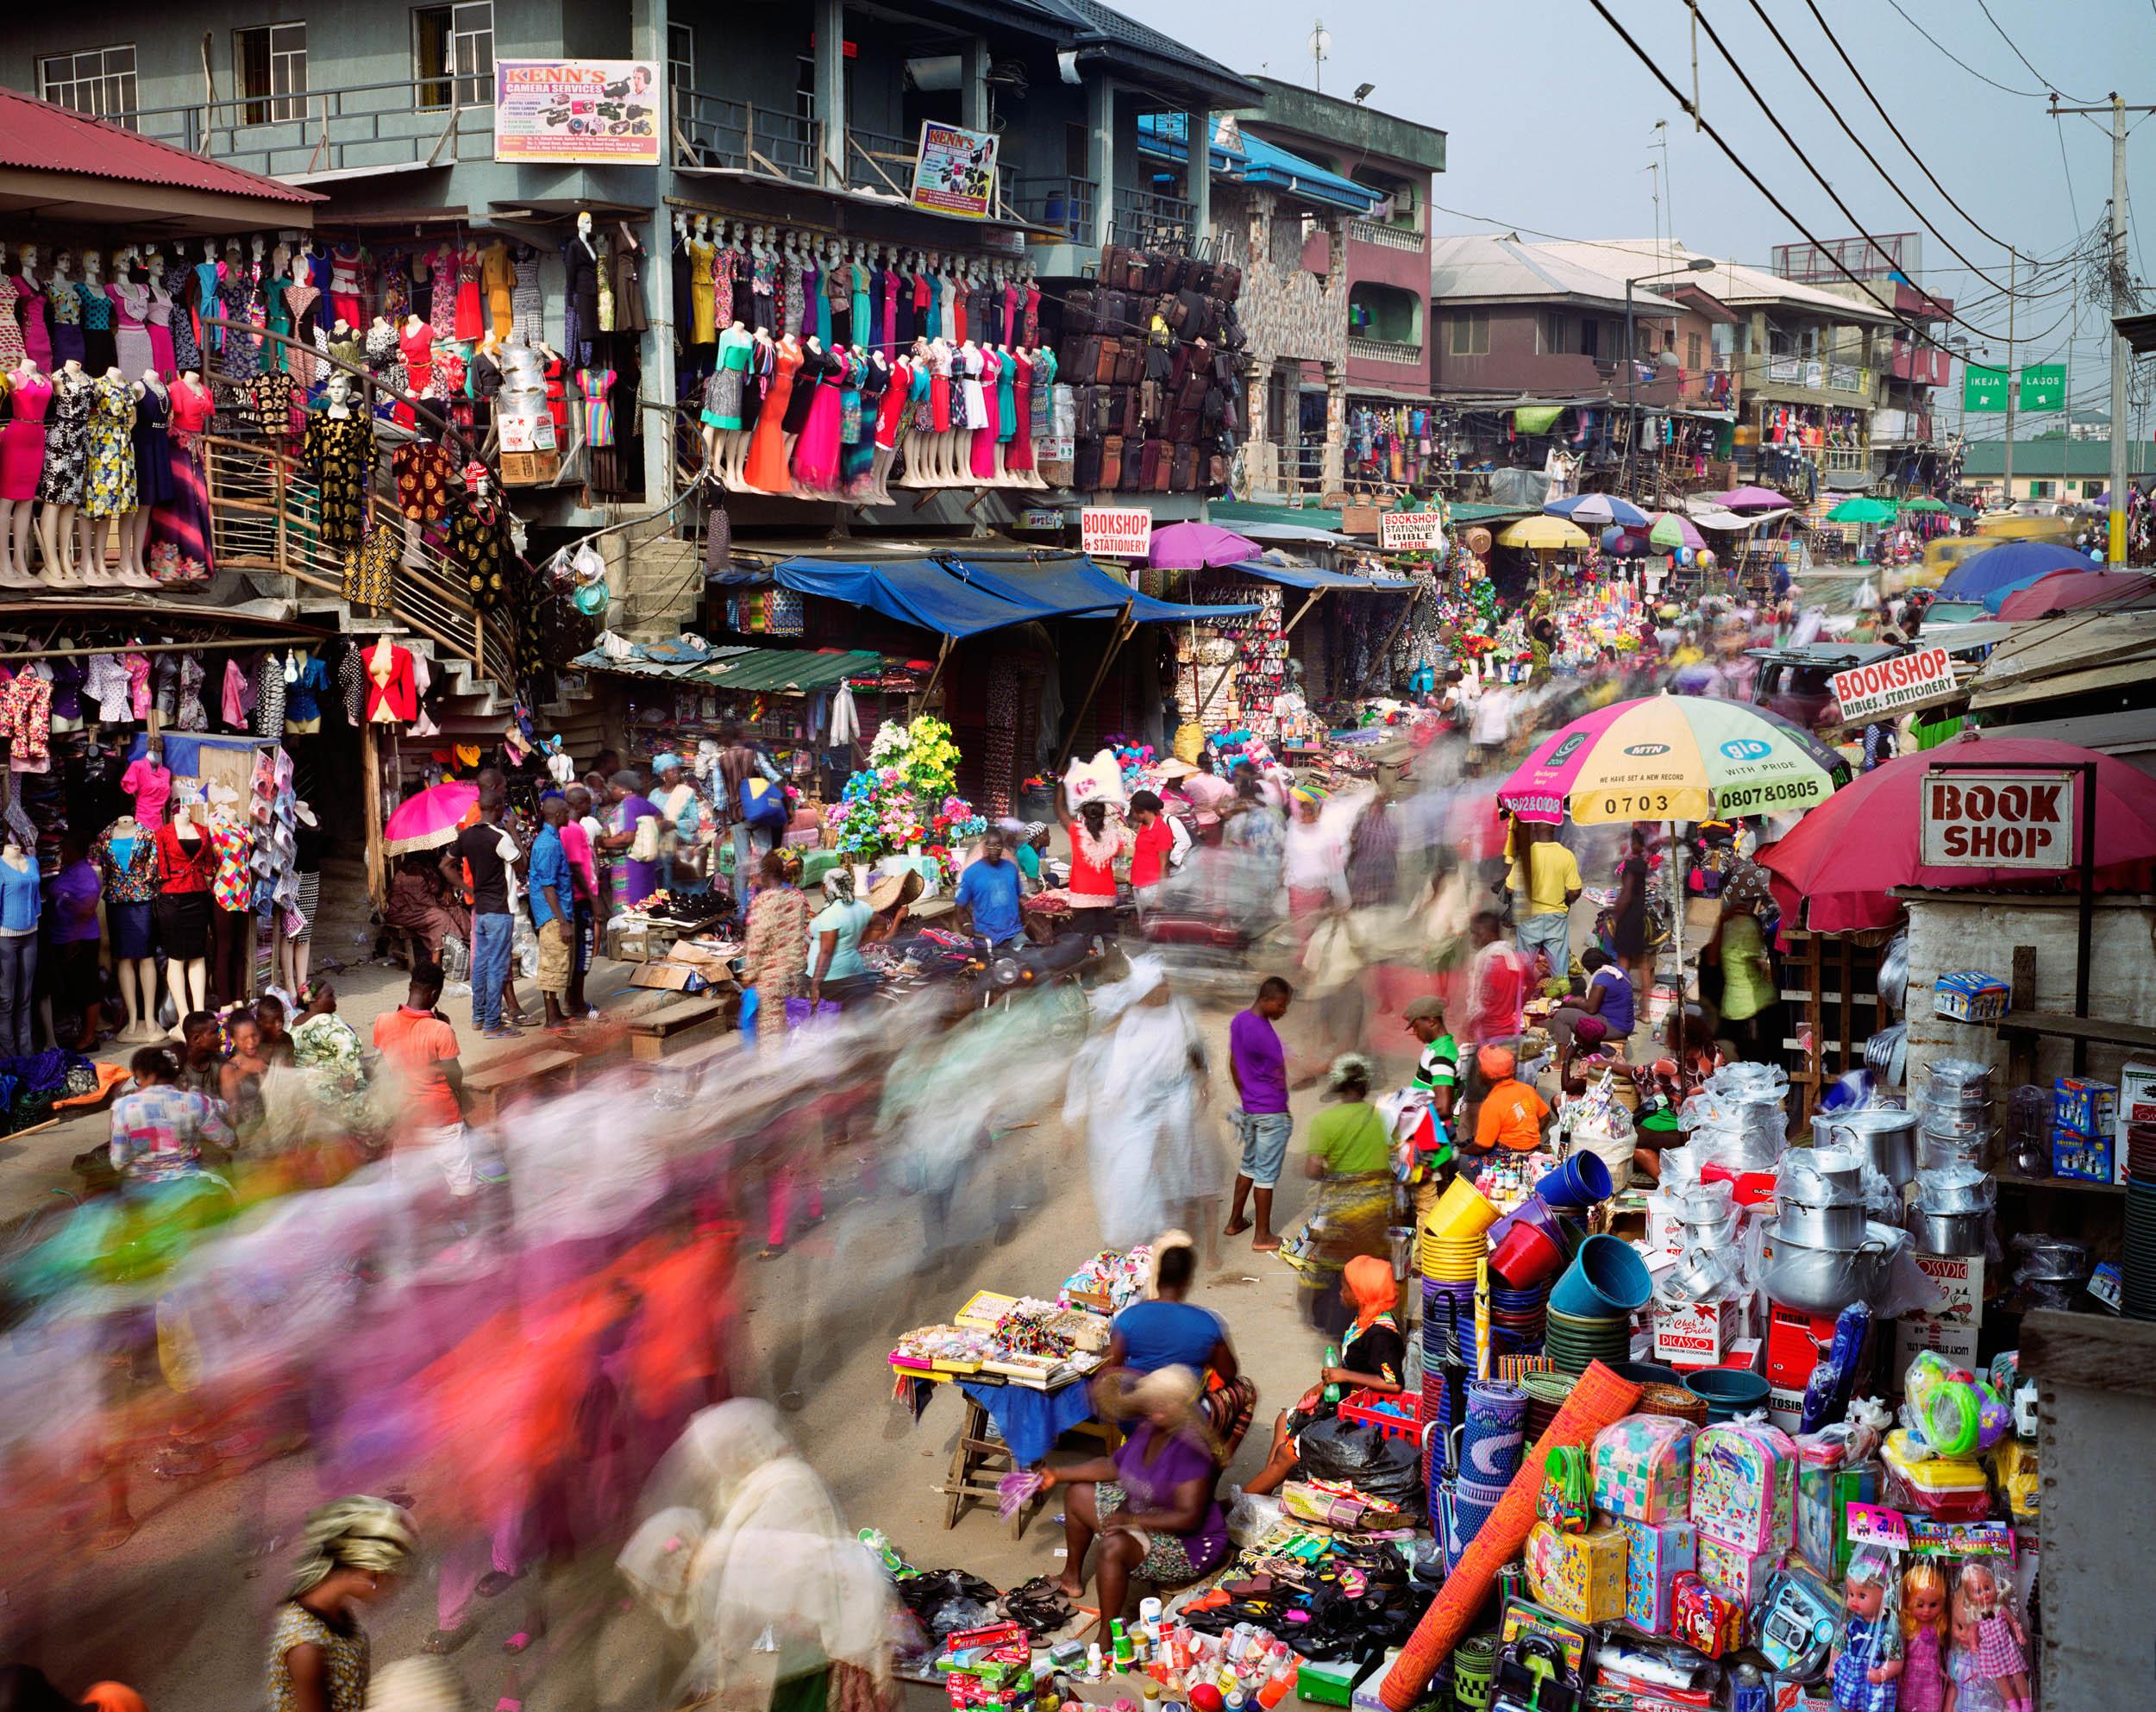 Oshodi Road, Oshodi, Lagos, Nigeria